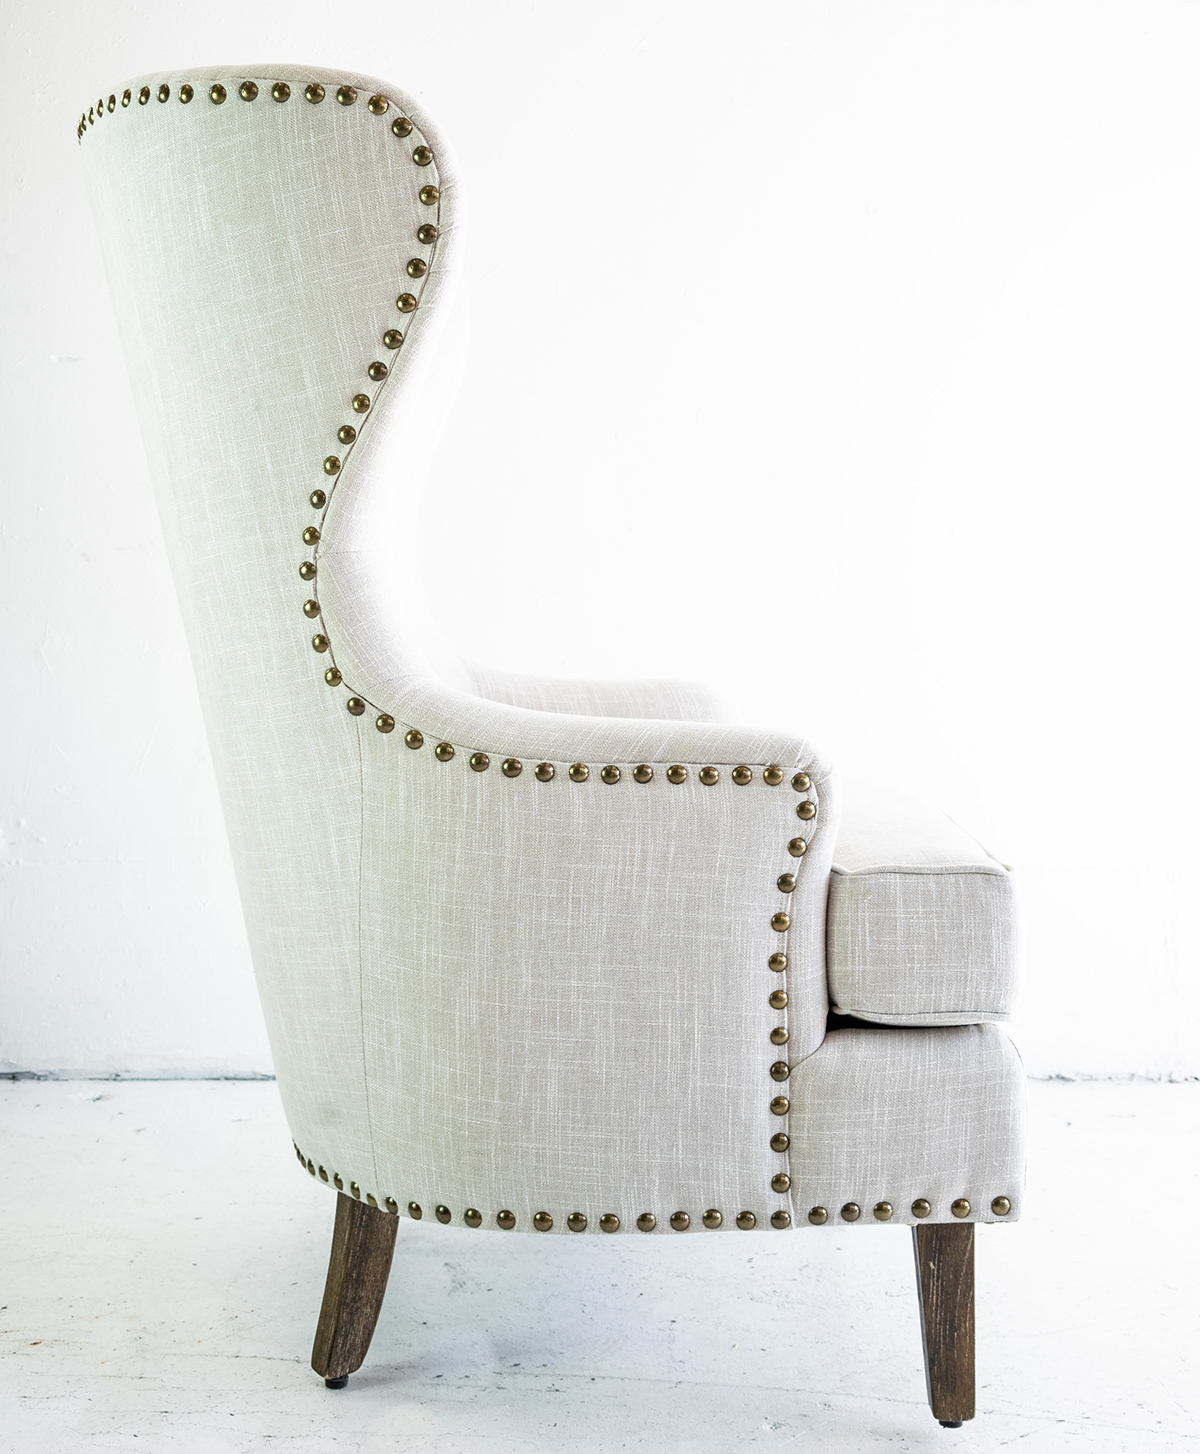 Nailed_Wingback_Chair.jpg